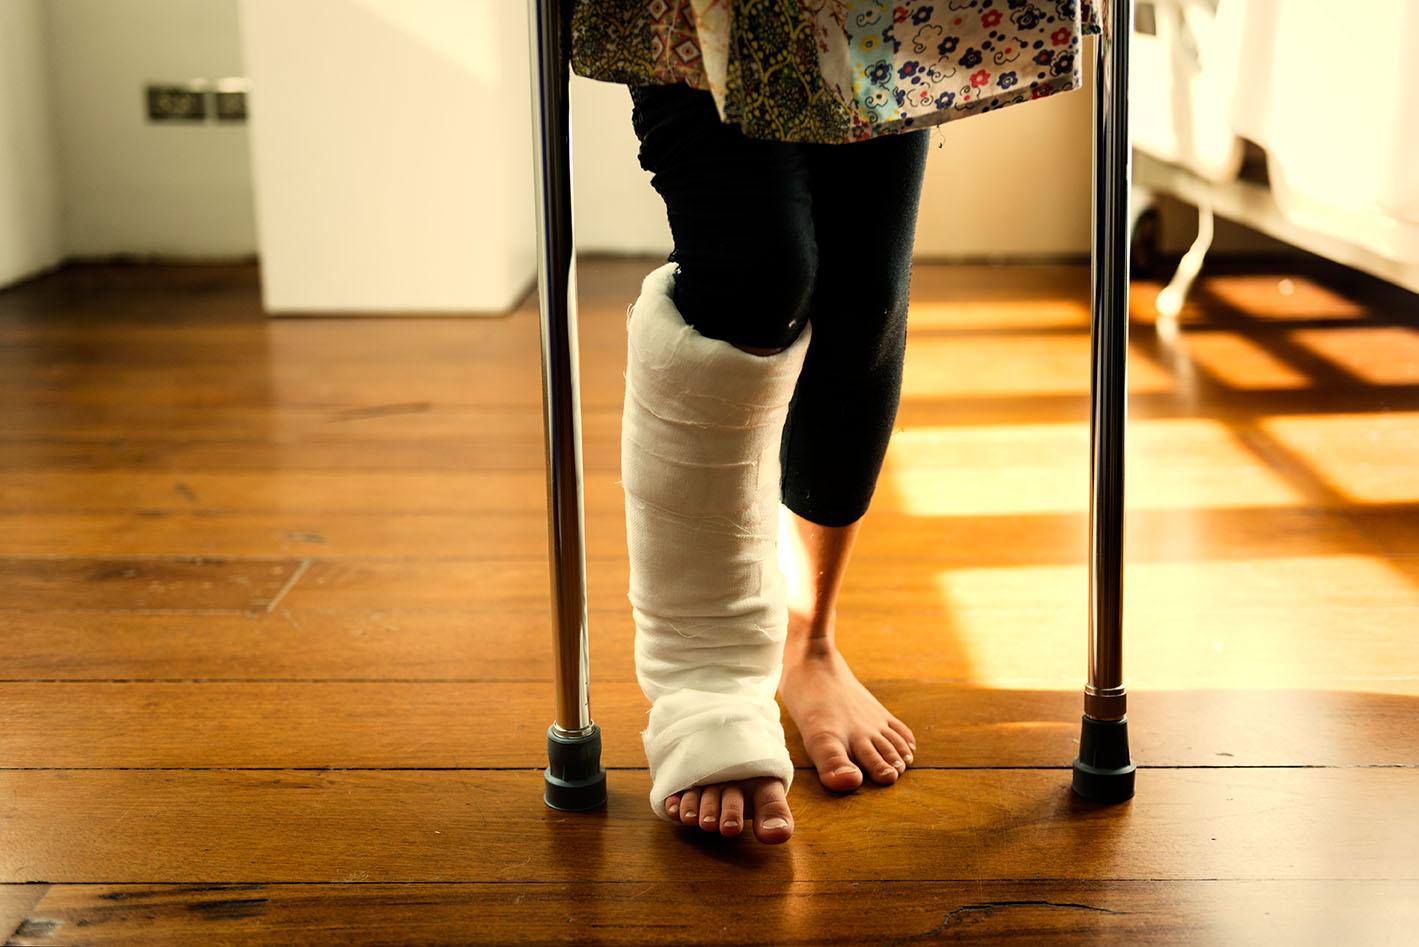 Die Hausfeen Beinverletzung